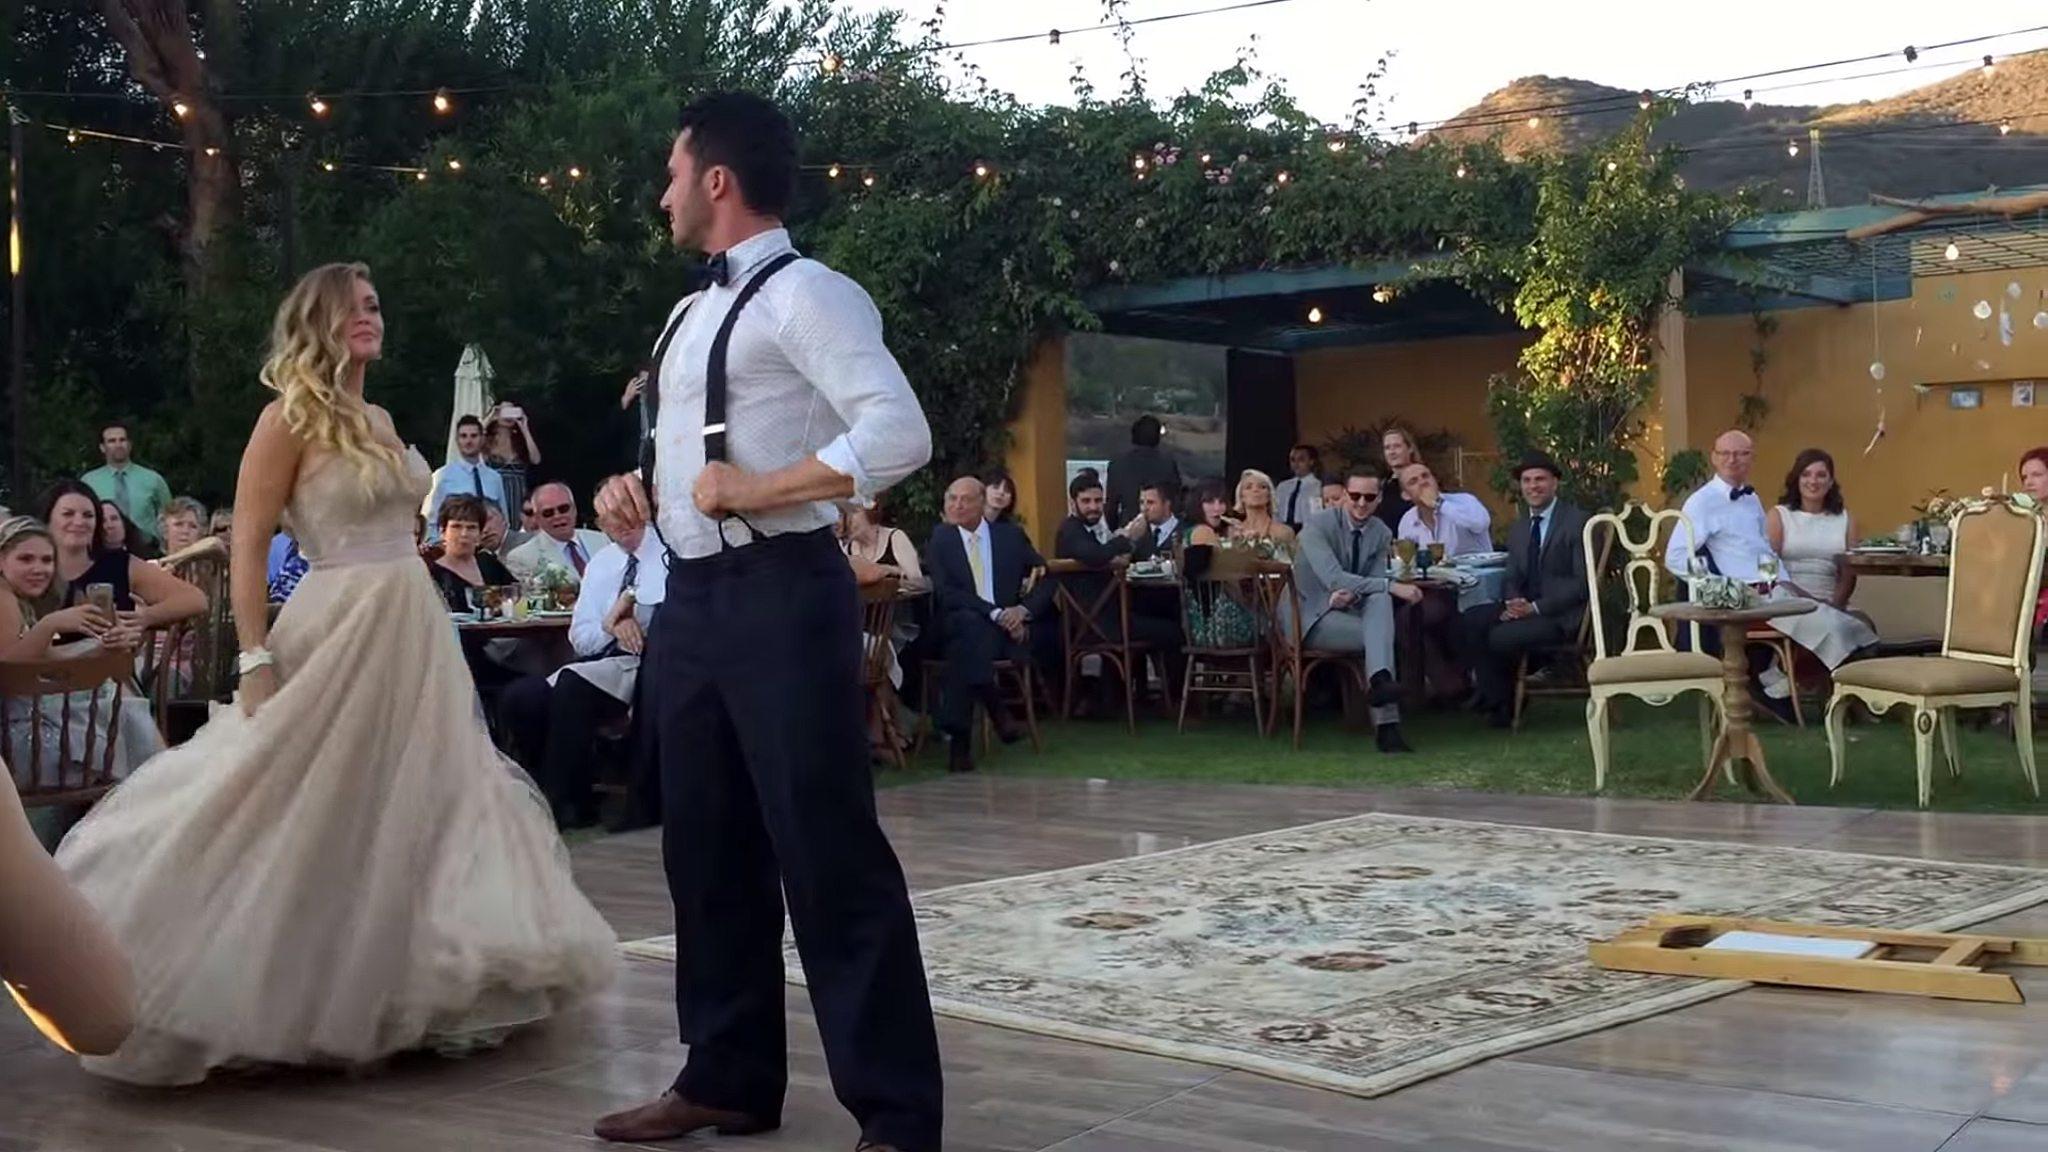 spellbound-groom-dance-featured-image